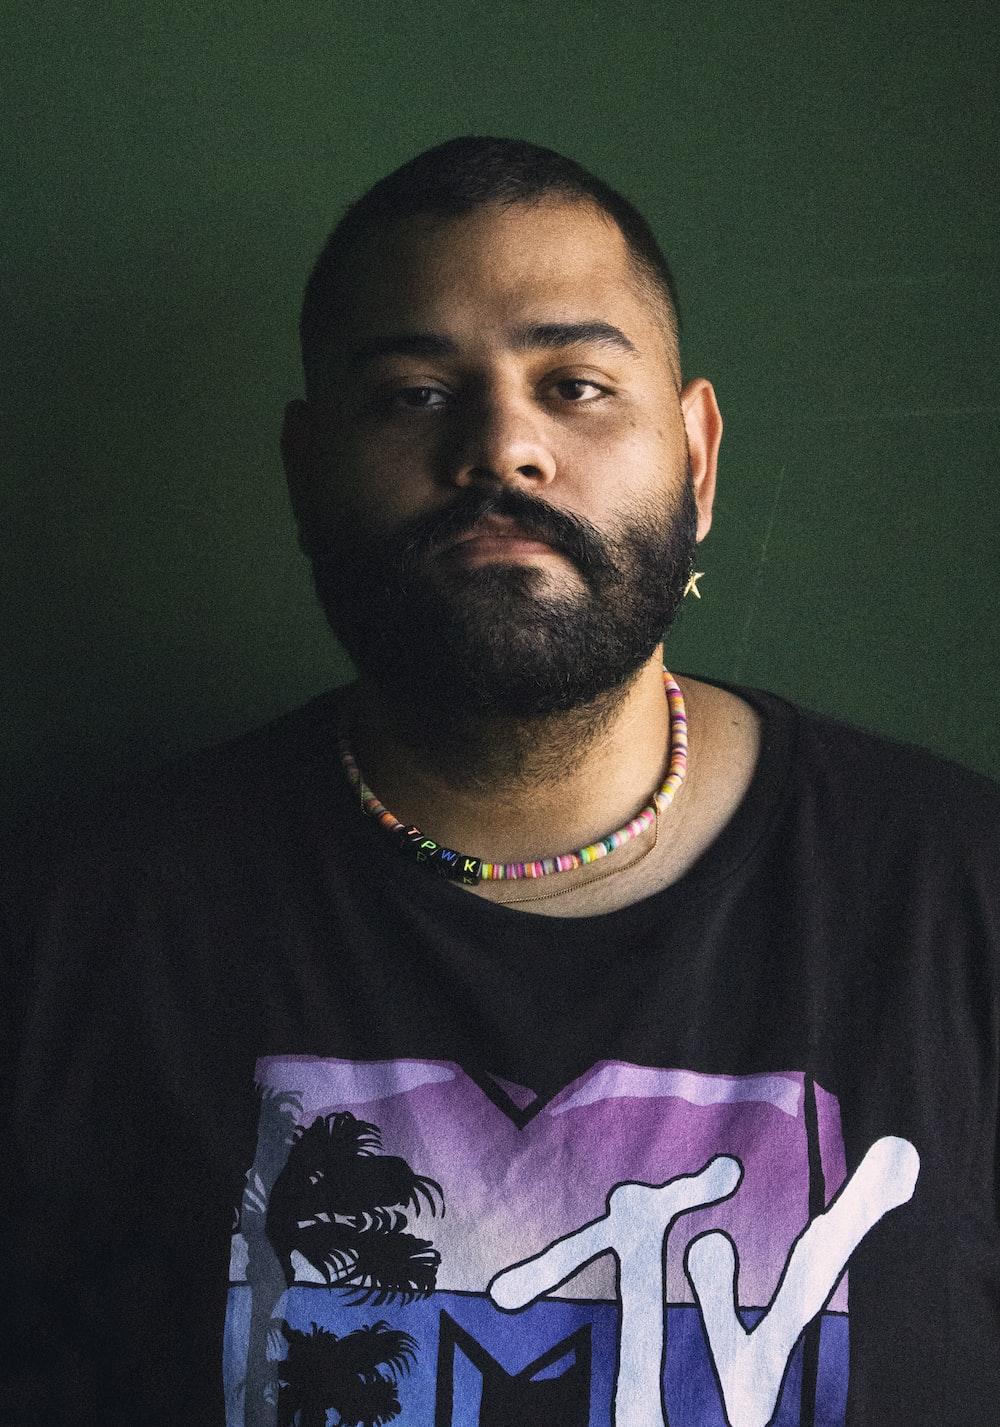 man in black crew neck shirt